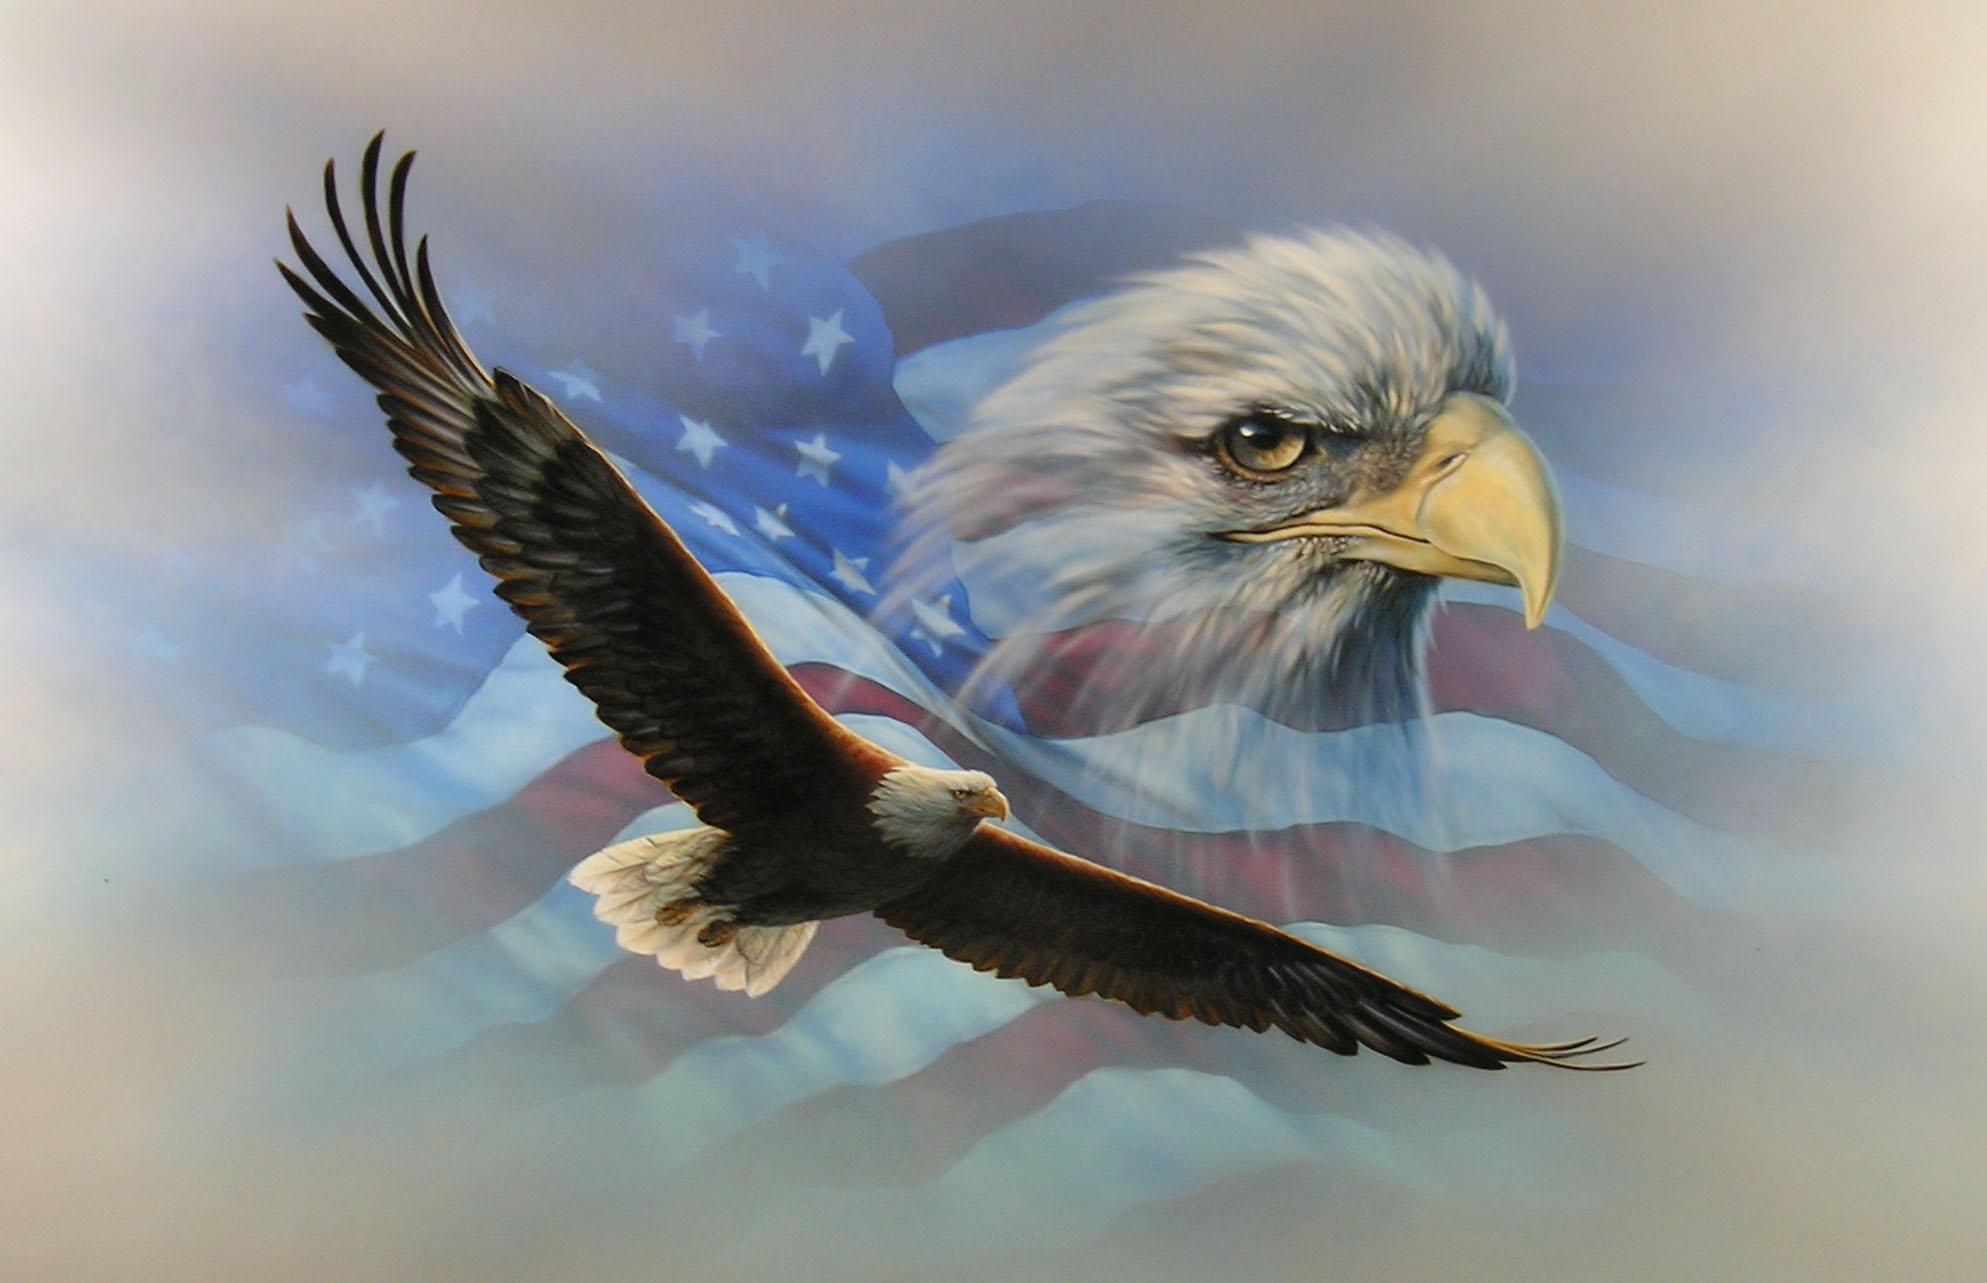 American Bald Eagle Wallpaper 3 1987x1283